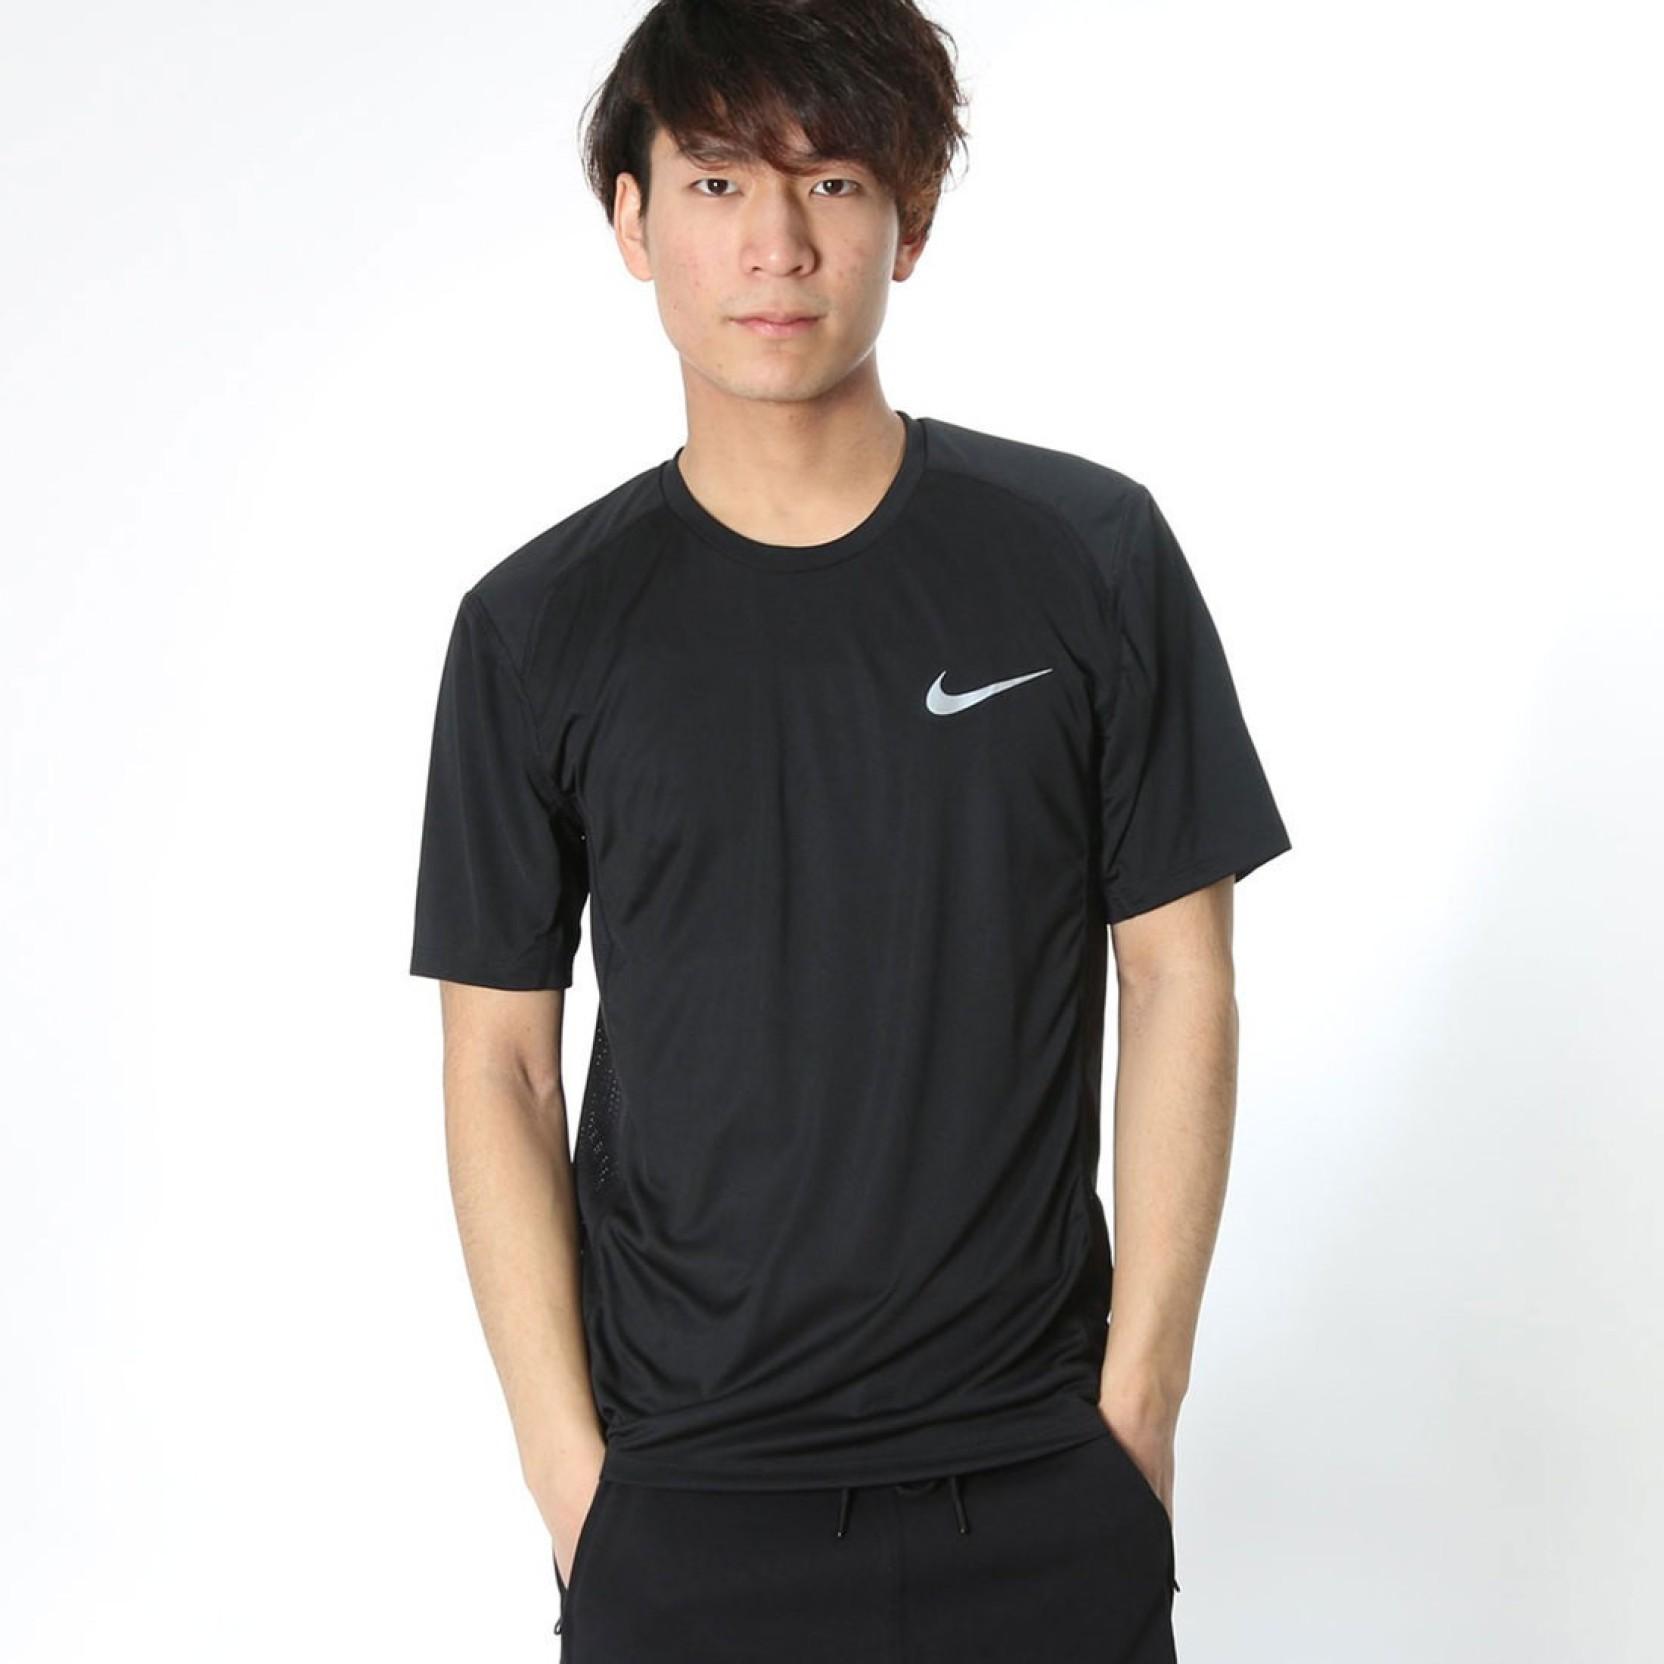 f6c1da08aba993 Nike Dri Fit T Shirt Flipkart - BCD Tofu House